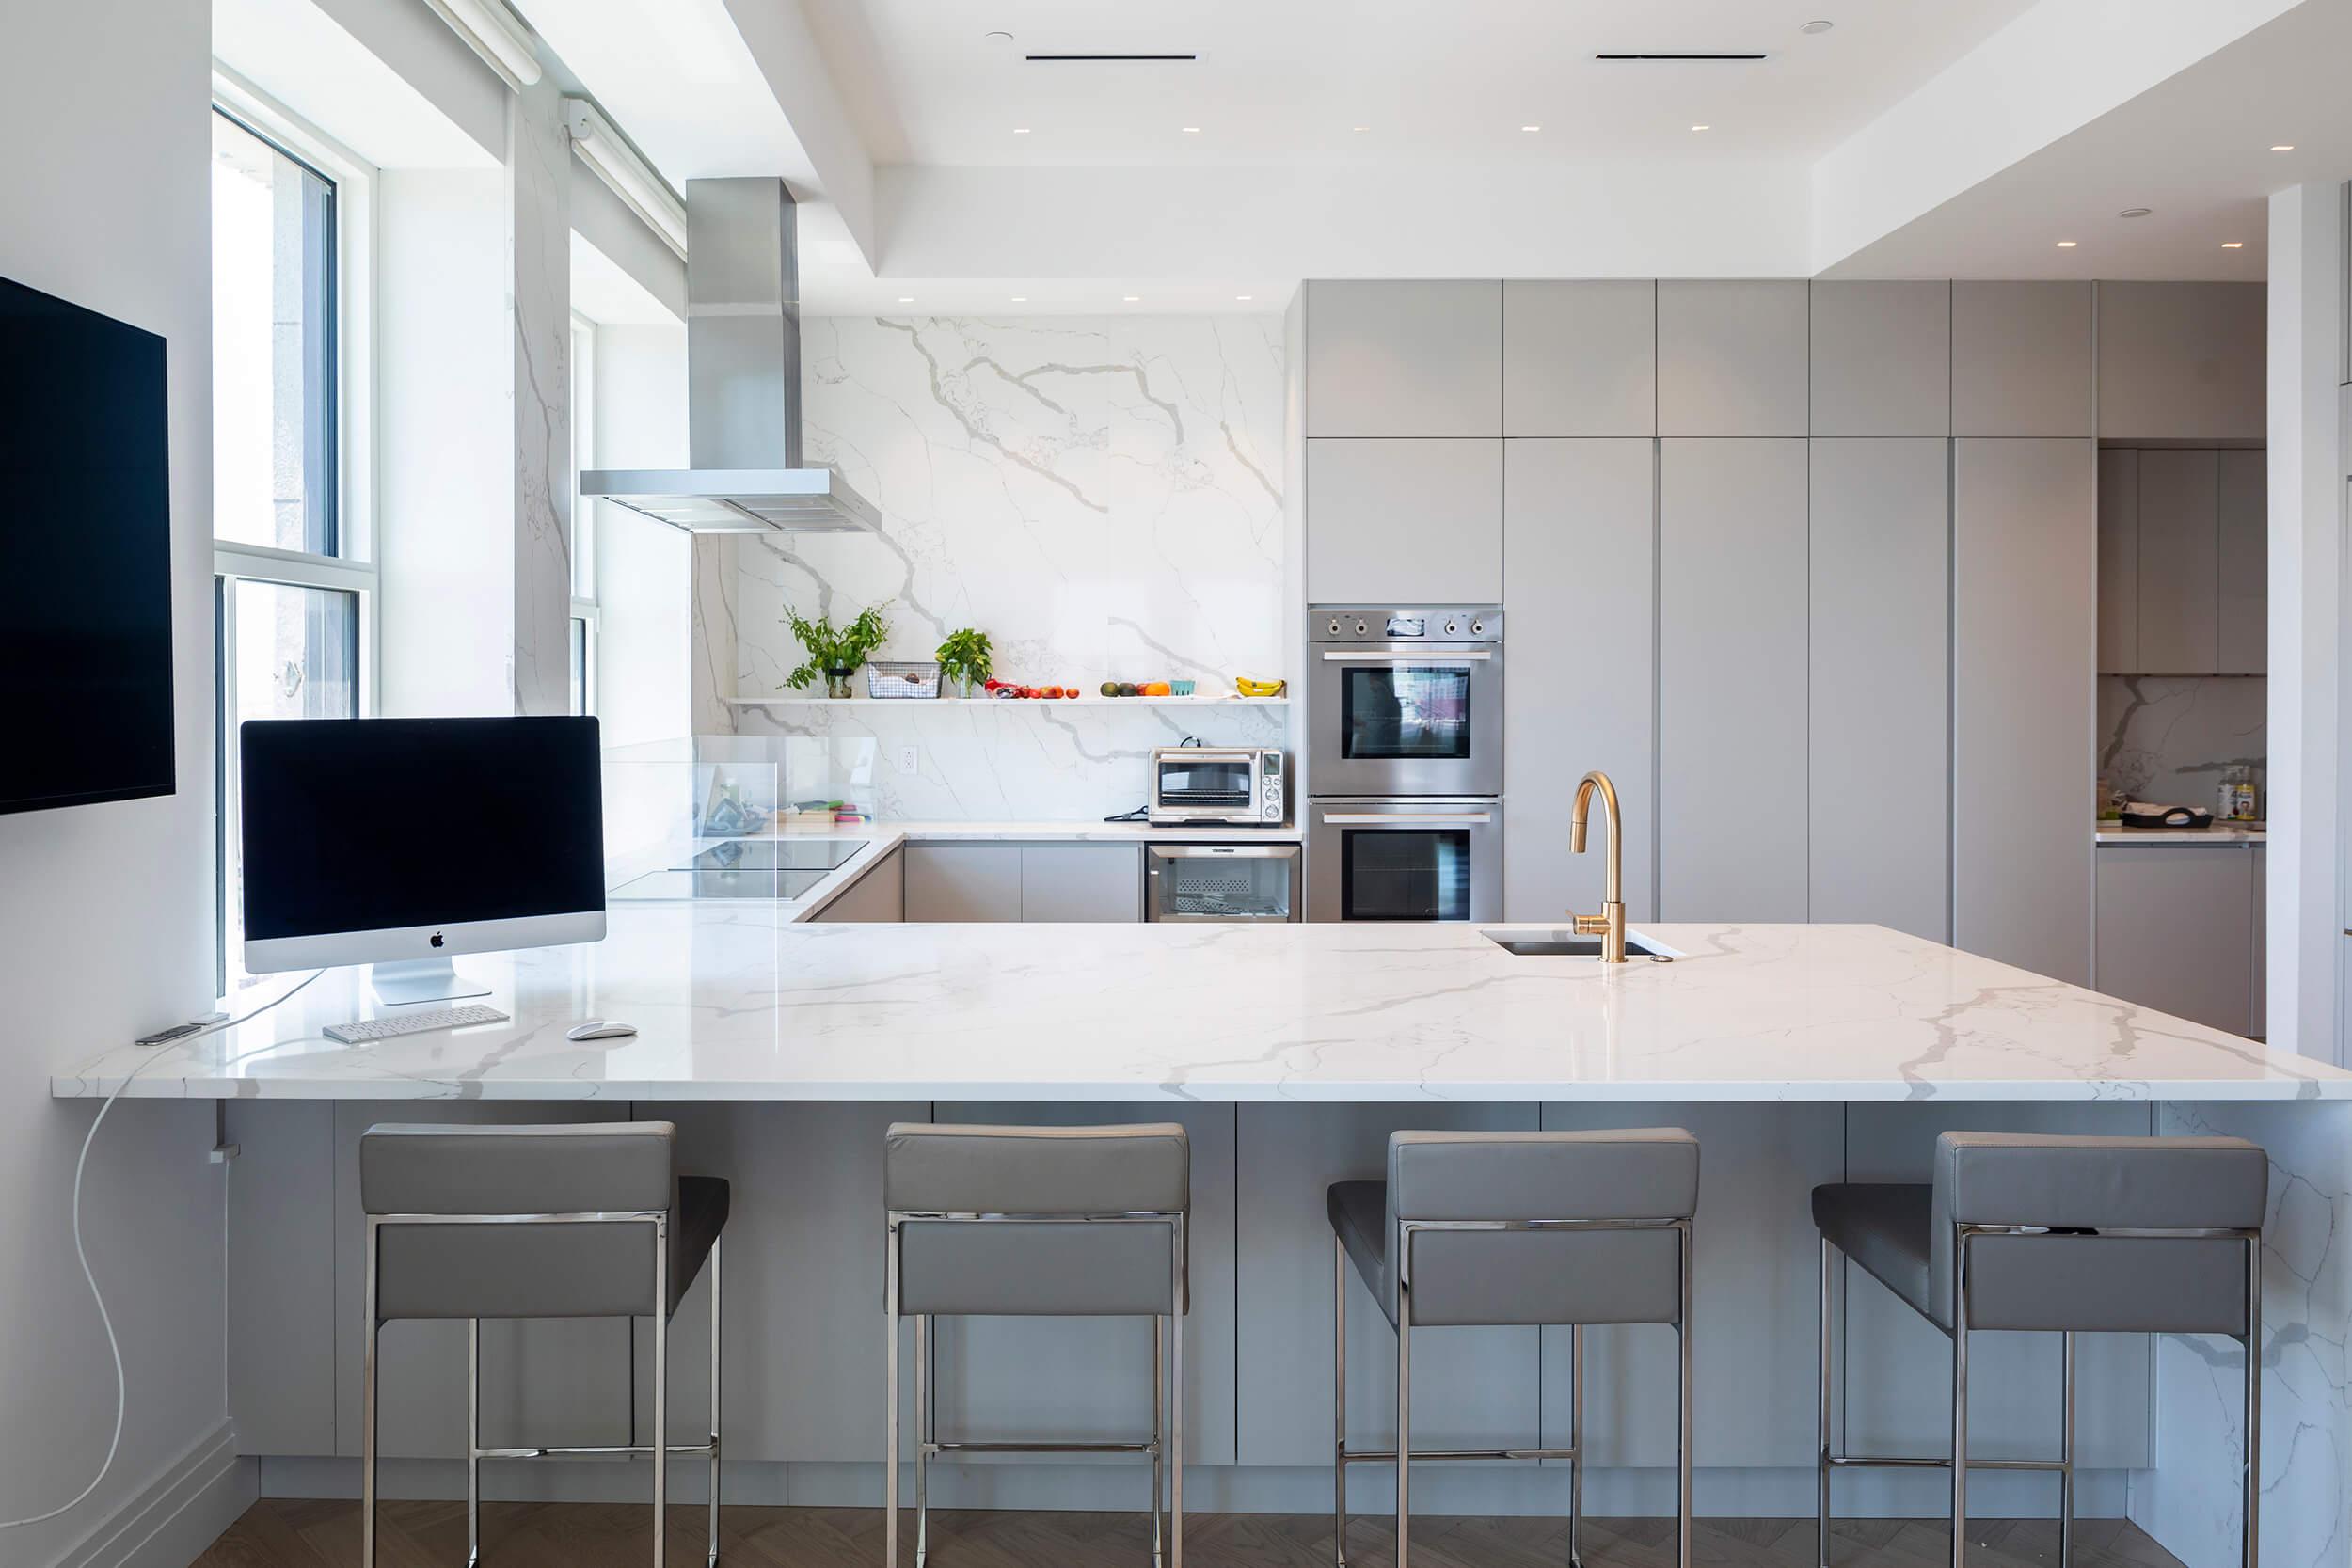 4BR Penthouse Kitchen 2